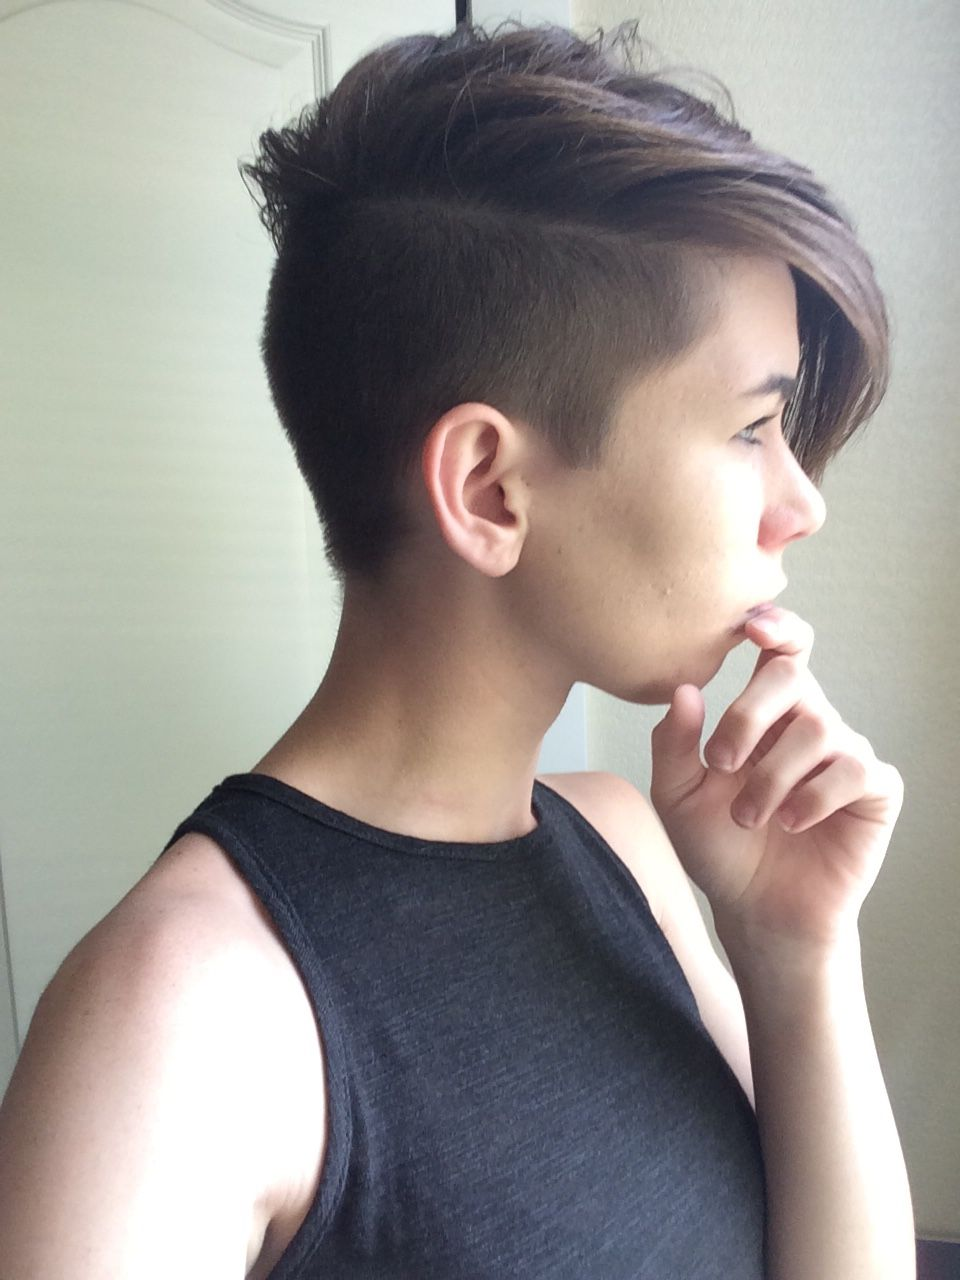 side cut | hair and beauty in 2019 | short hair undercut